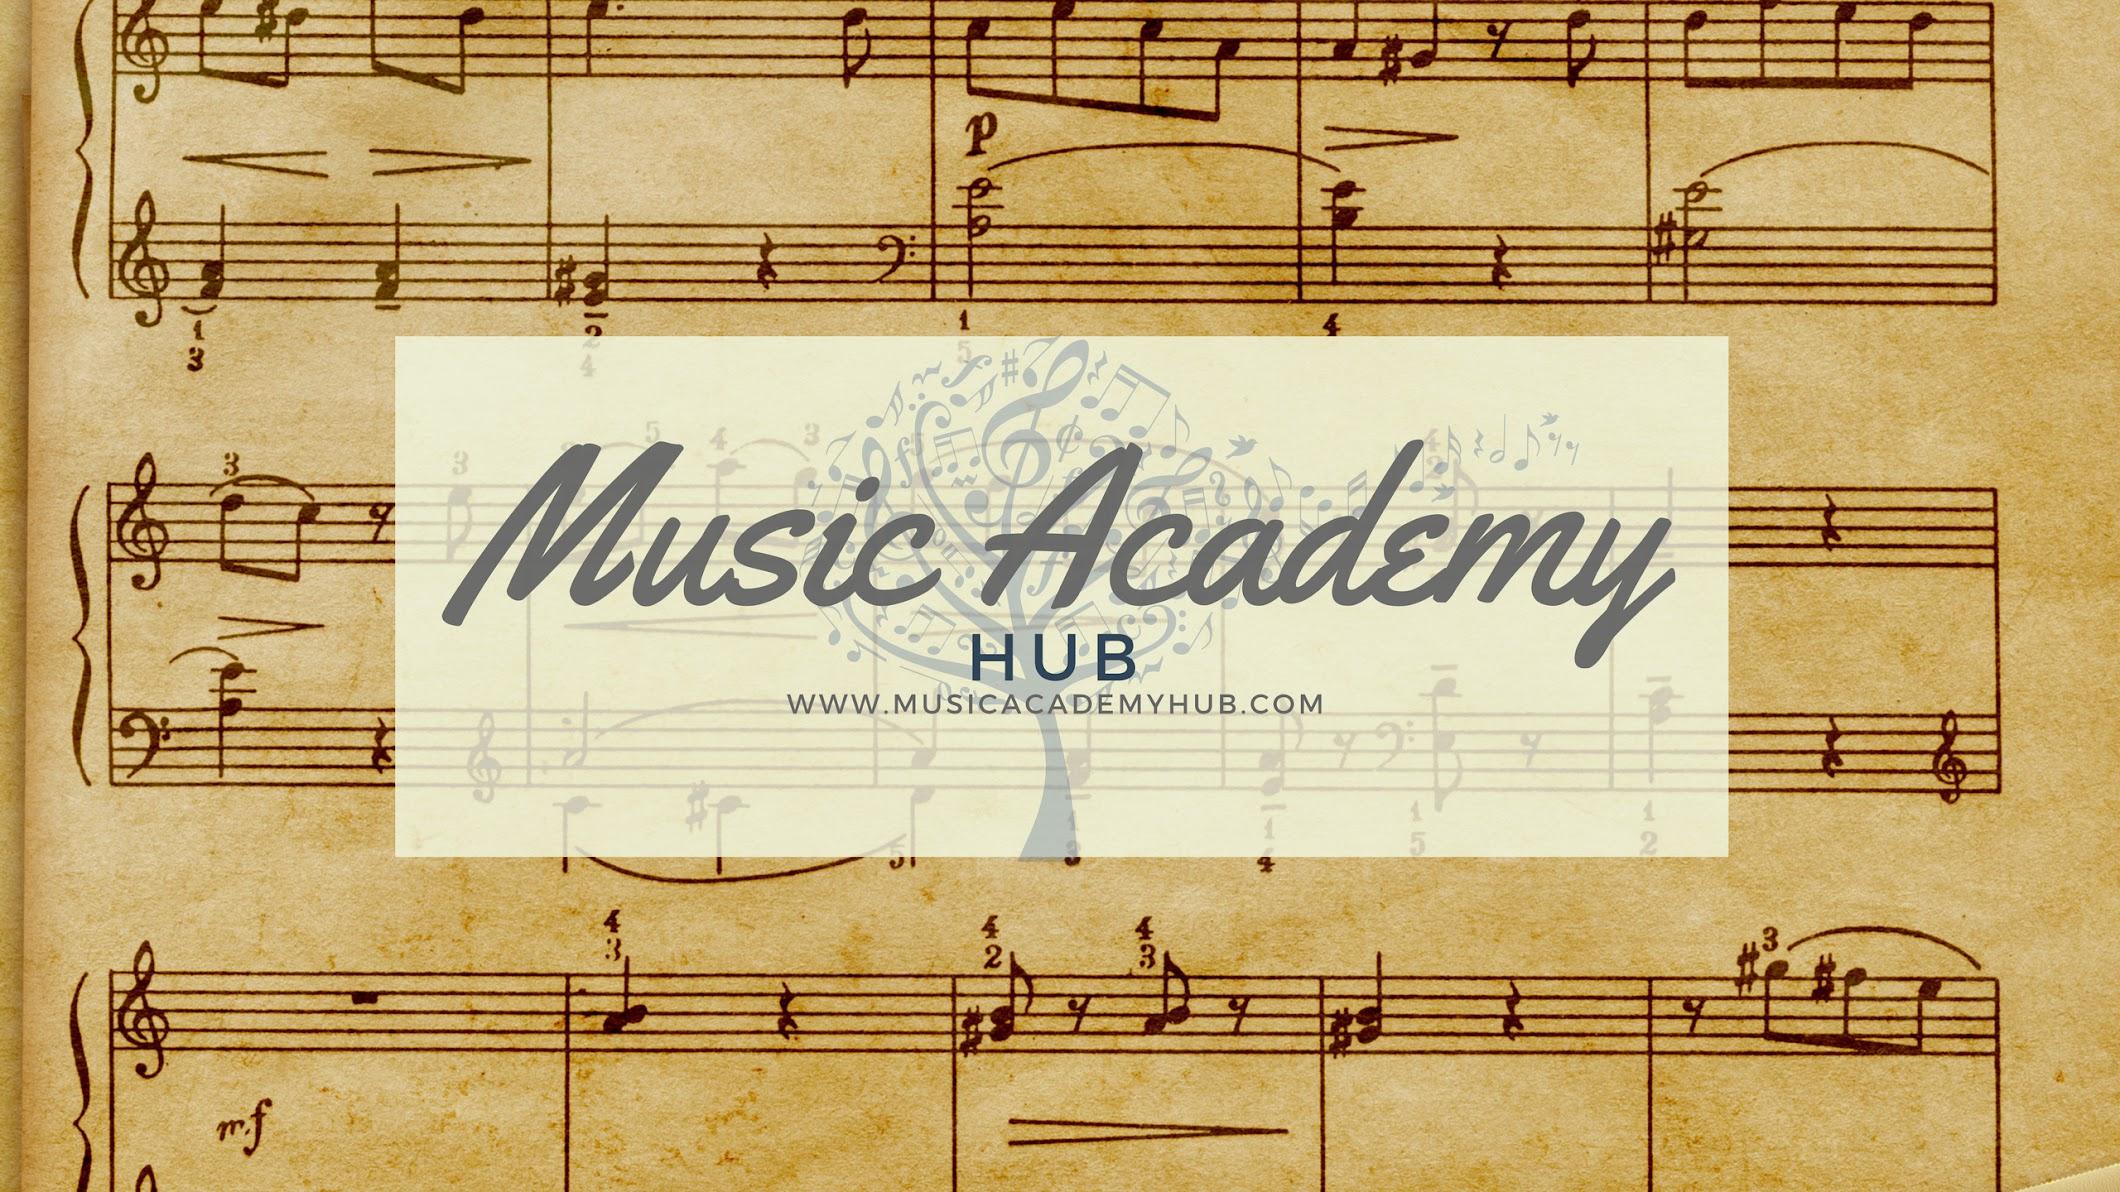 Music Academy Hub